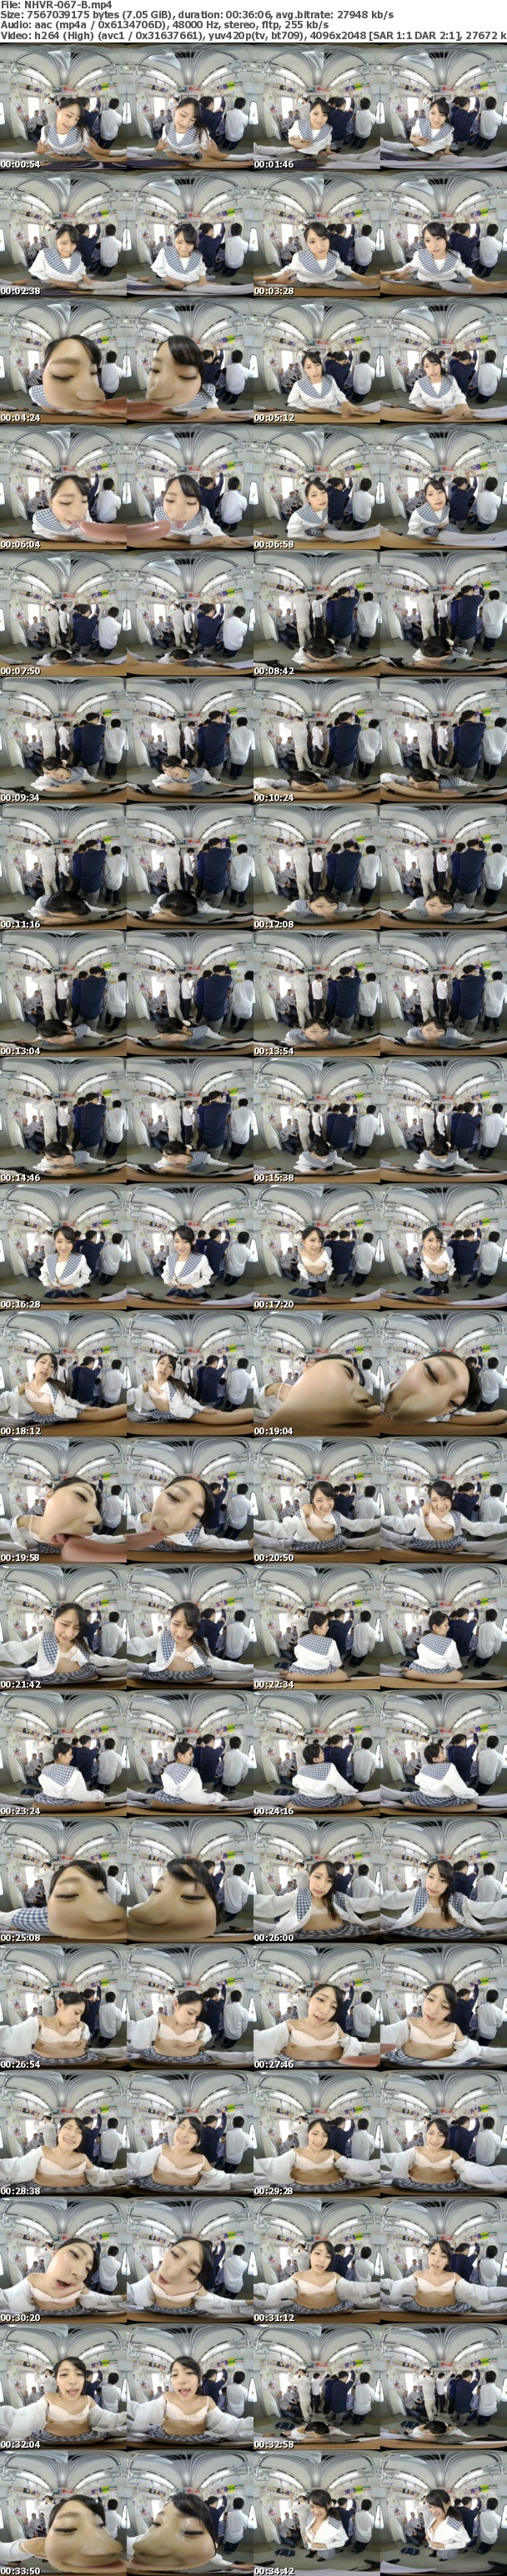 (VR) NHVR-067 唾液ダラダラ接吻痴● VR2 オヤジを虜にするほど密着して舐めまくる痴女子○生